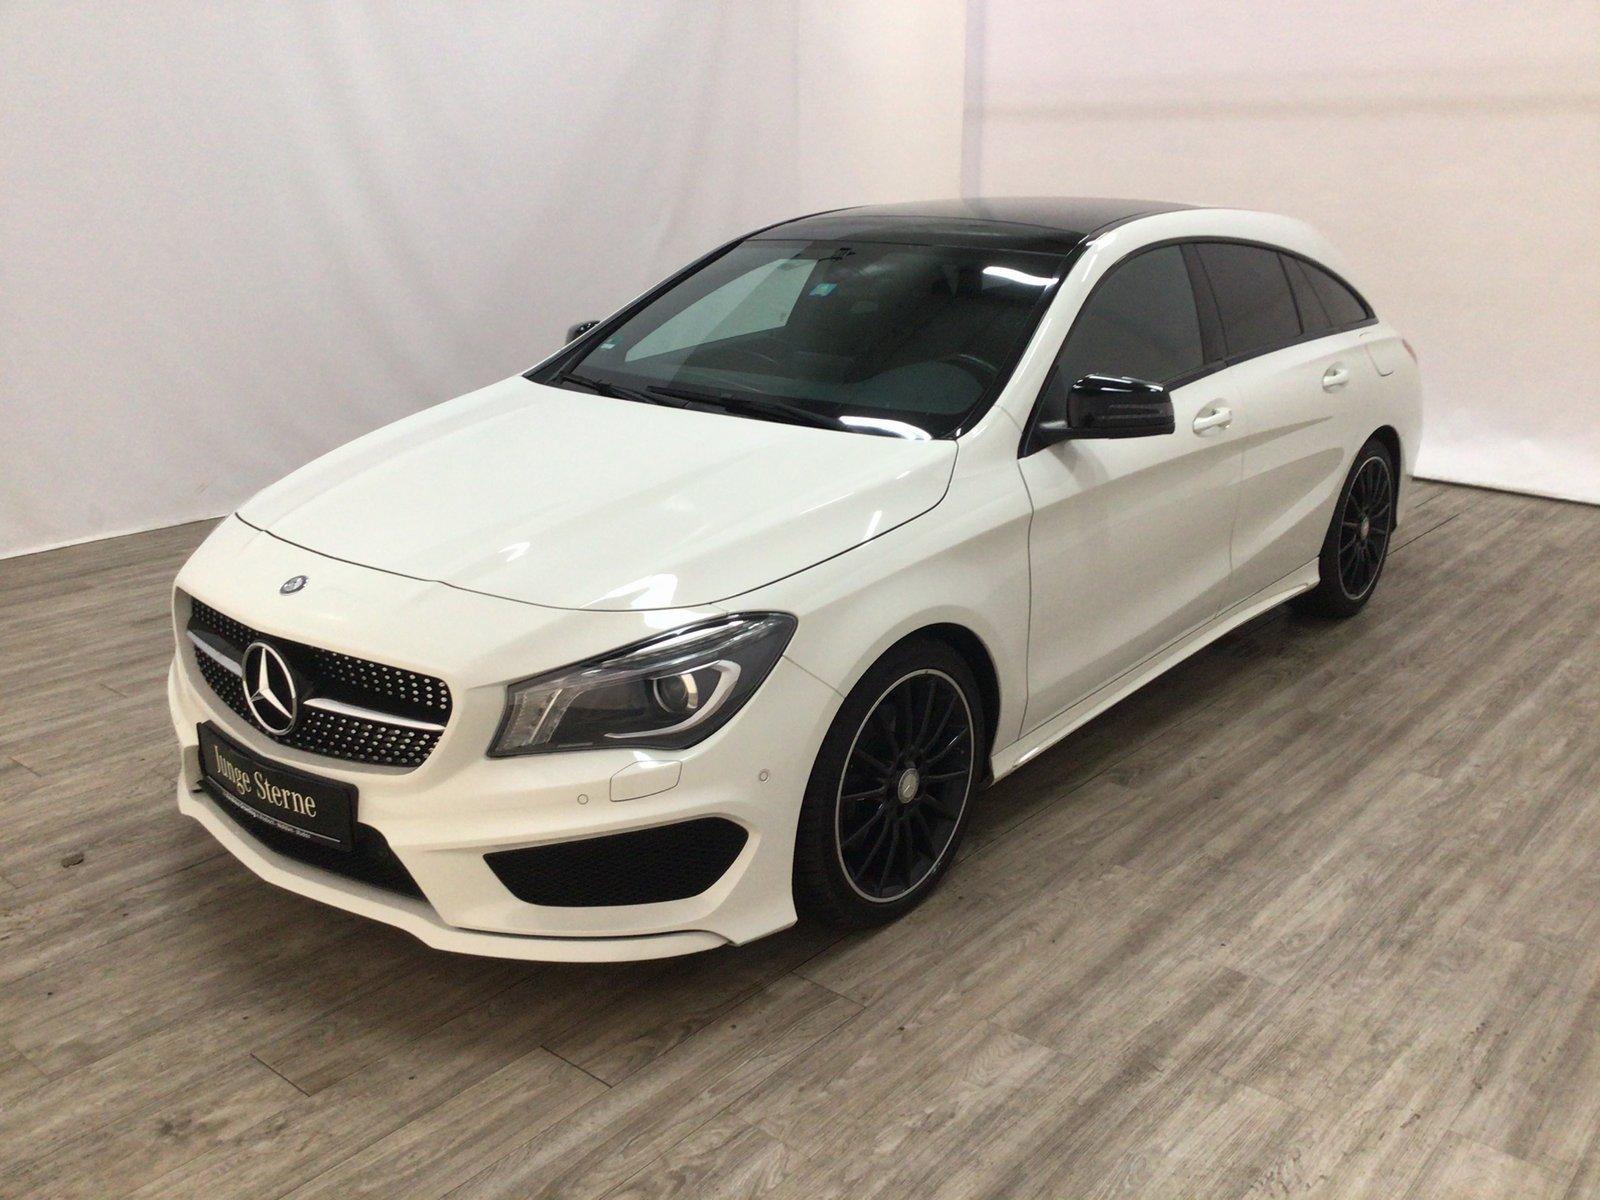 Mercedes-Benz CLA 220 d SB AMG*NIGHT*Leder*Bi-Xenon*Pano*Navi*, Jahr 2015, Diesel